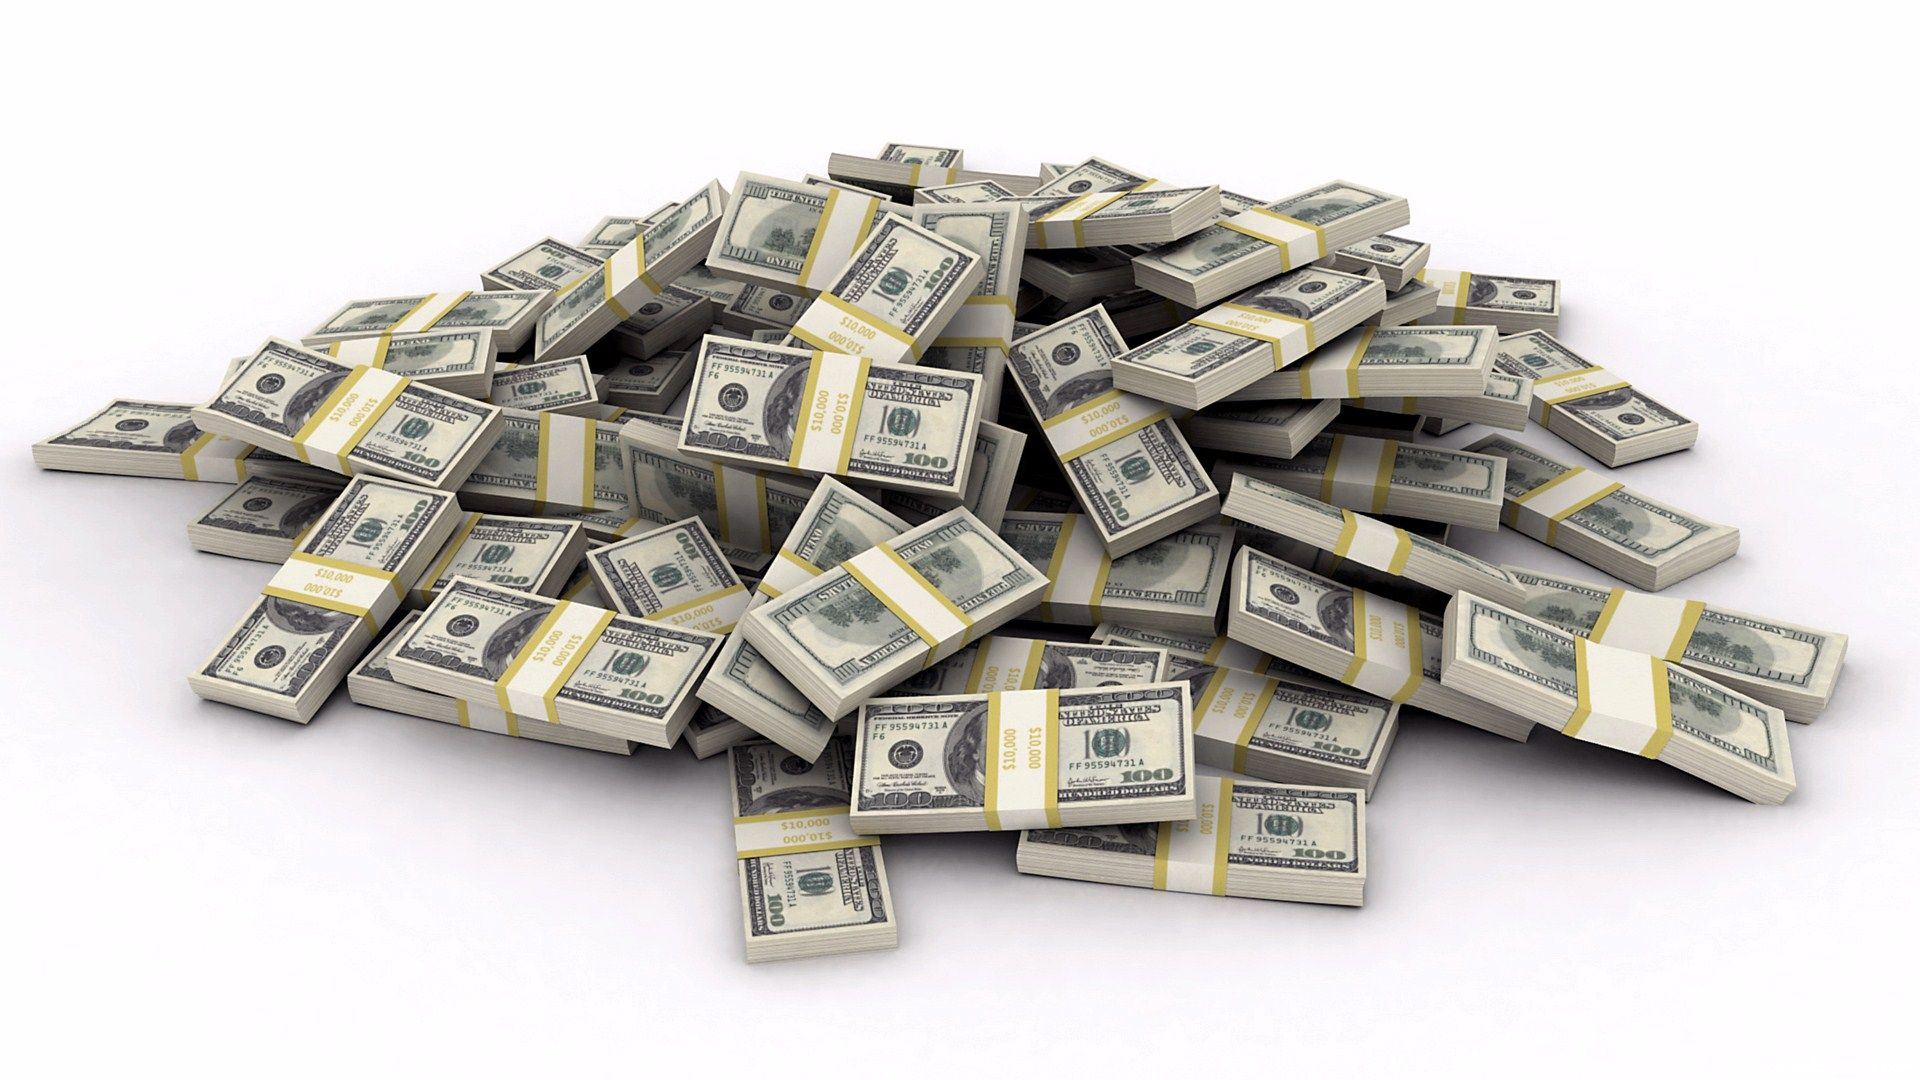 Cash loans online new york image 1